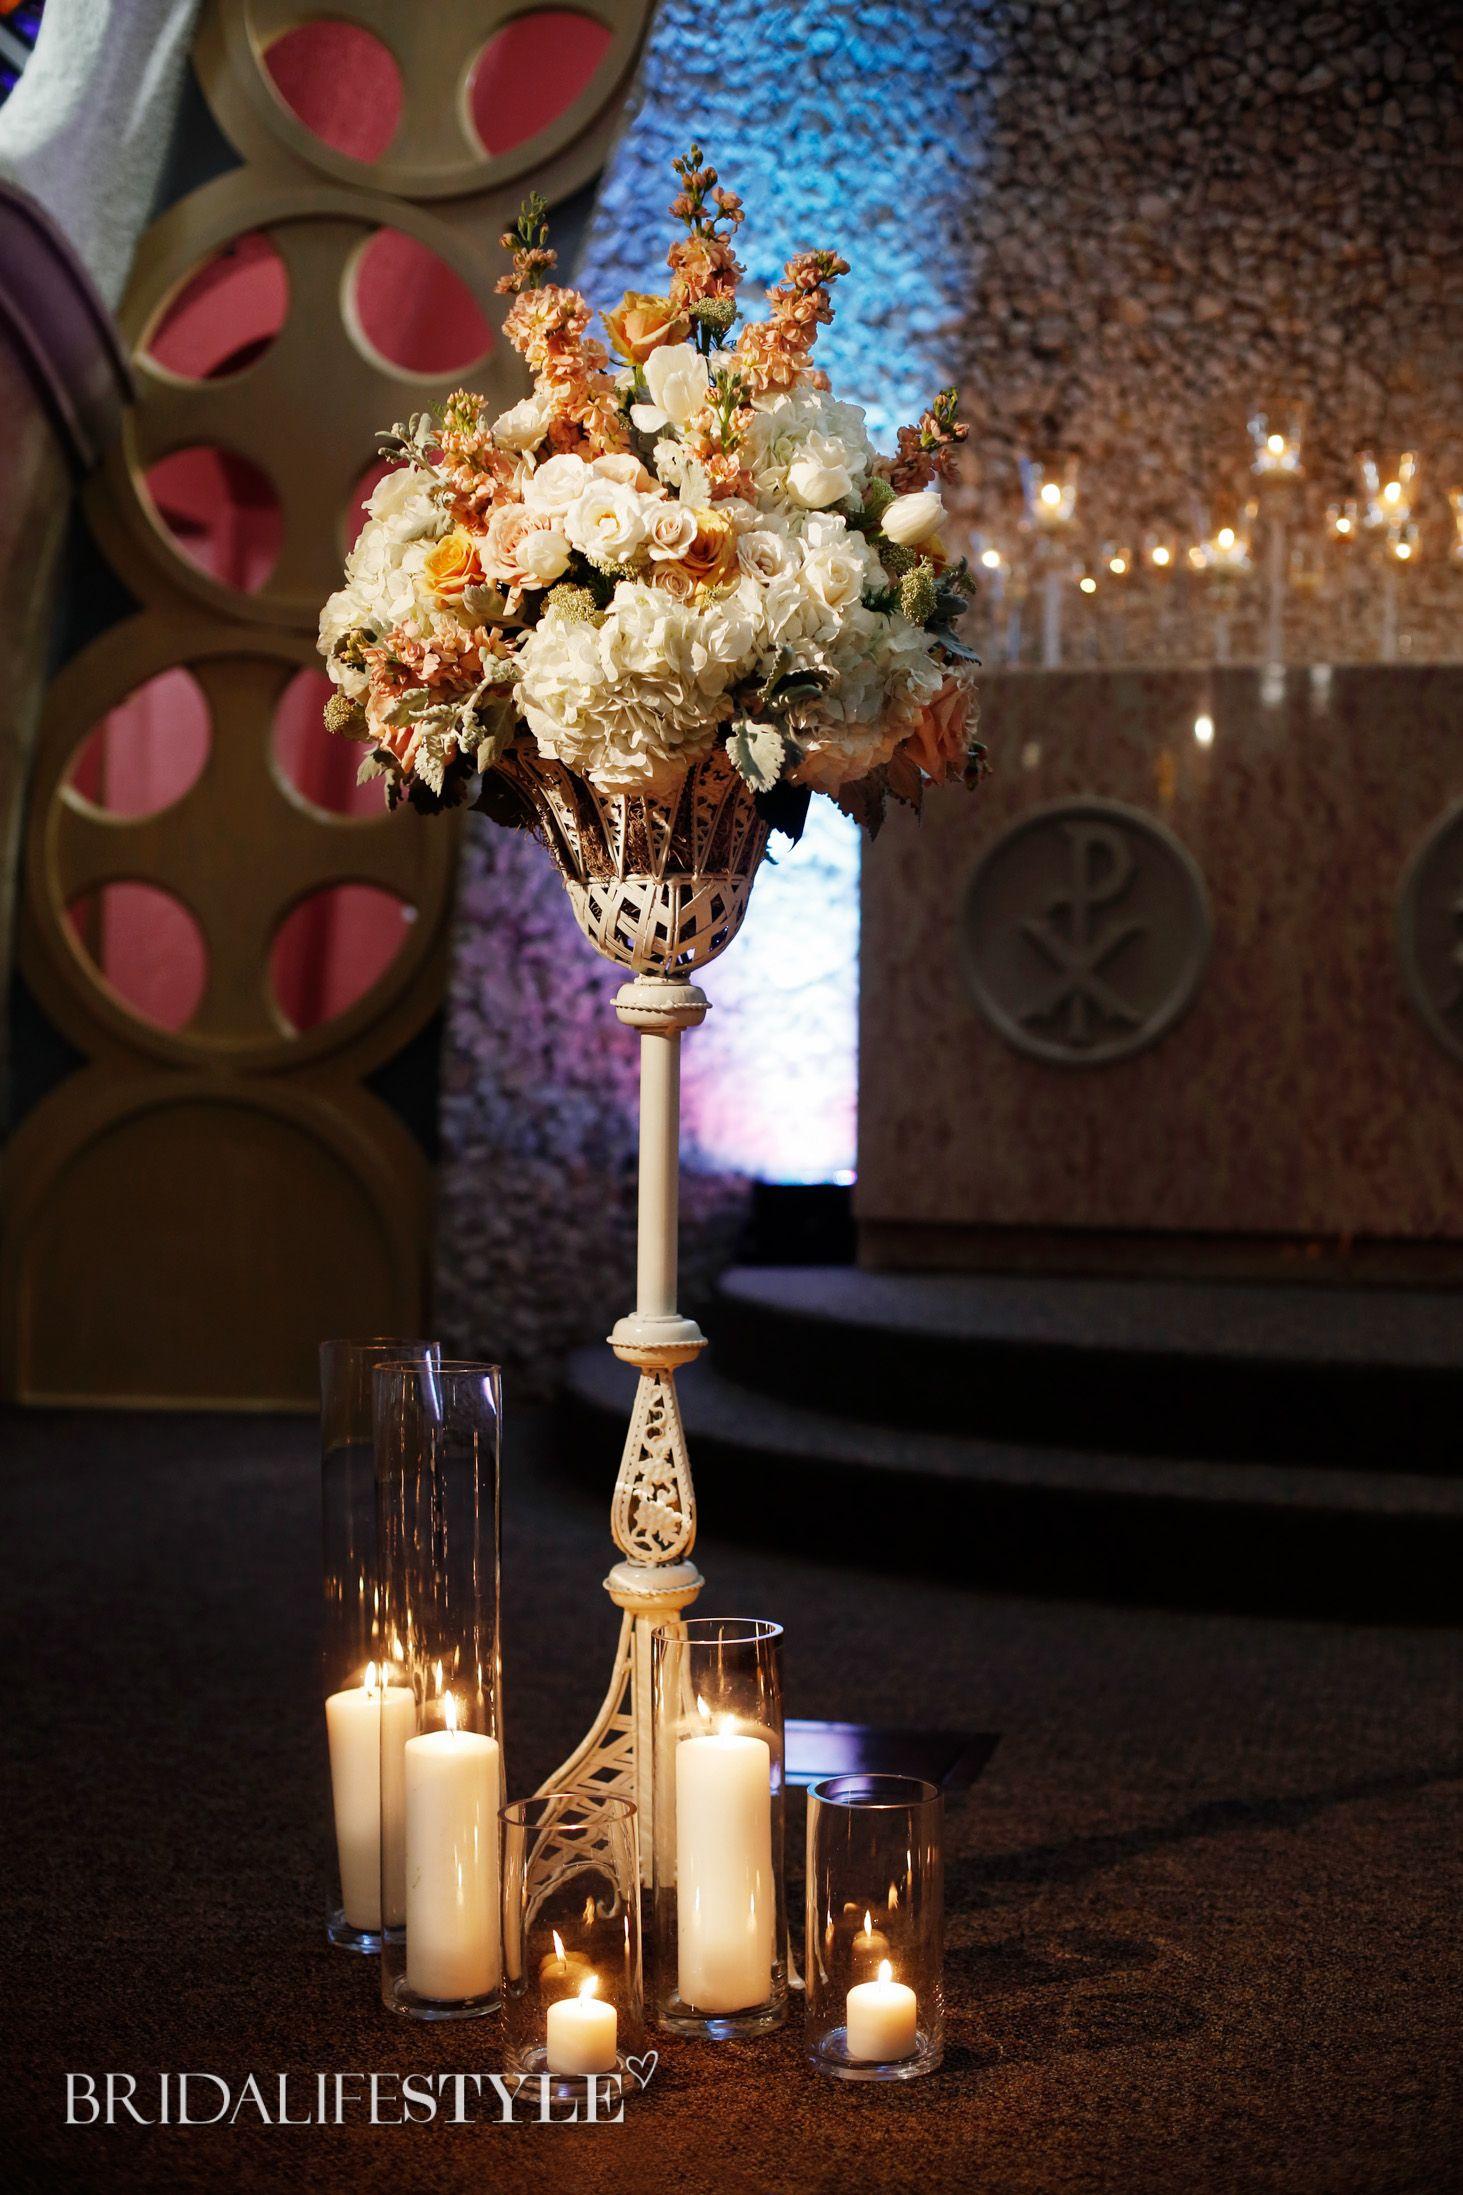 Oklahoma weddings inspiration- Nouveau Elegance - Bridalifestyle Magazine // Venue: www.Chapelonthehilltulsa.com | Photography: www.andreamurphyphotography.com | Designer: www.tulsaweddings.com | Floral: www. divinedesignsbymandy.com